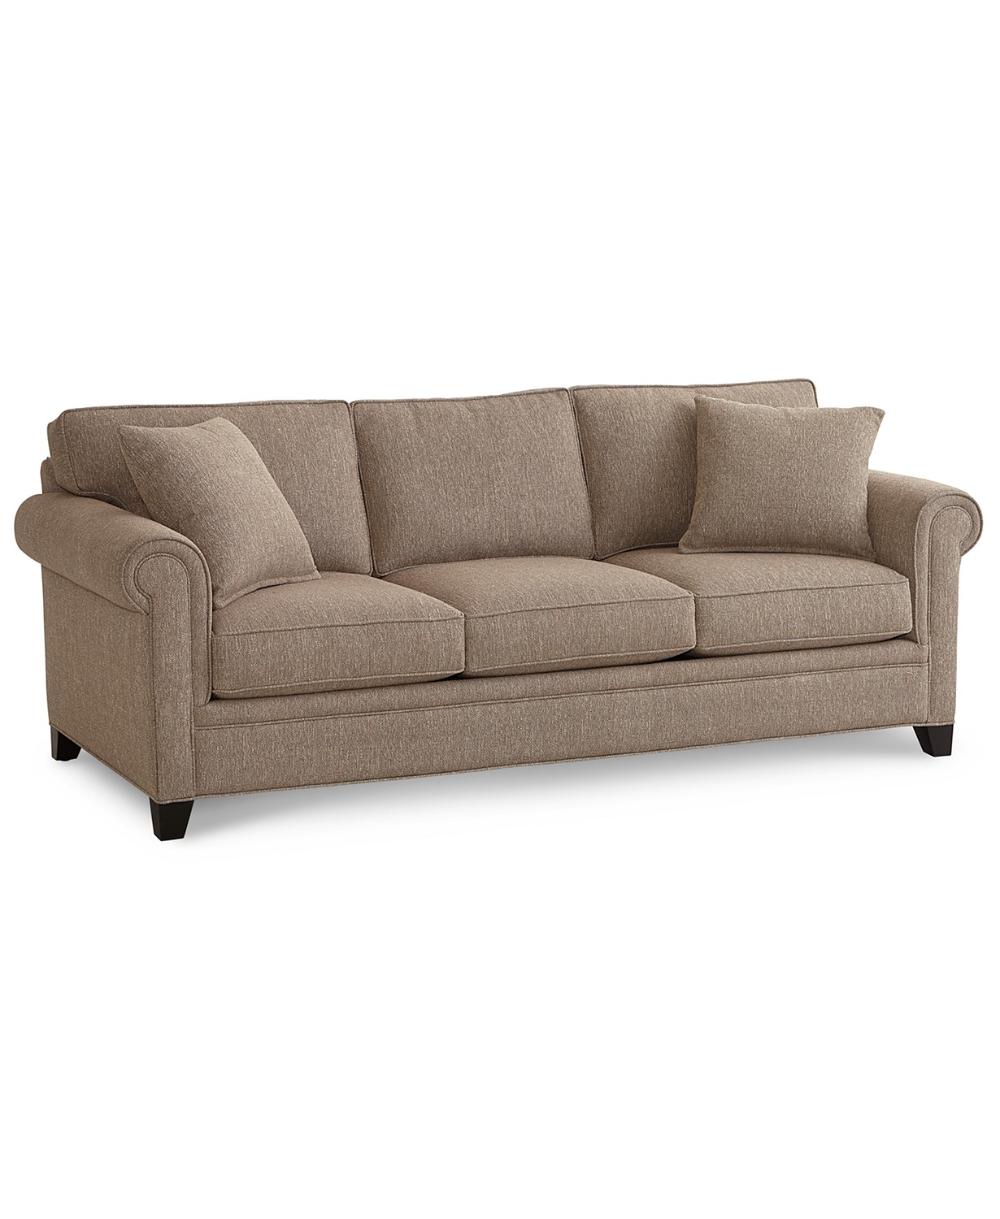 Furniture Banhart 90 Fabric Sofa Created For Macy S Reviews Furniture Macy S Fabric Sofa Furniture Sofa